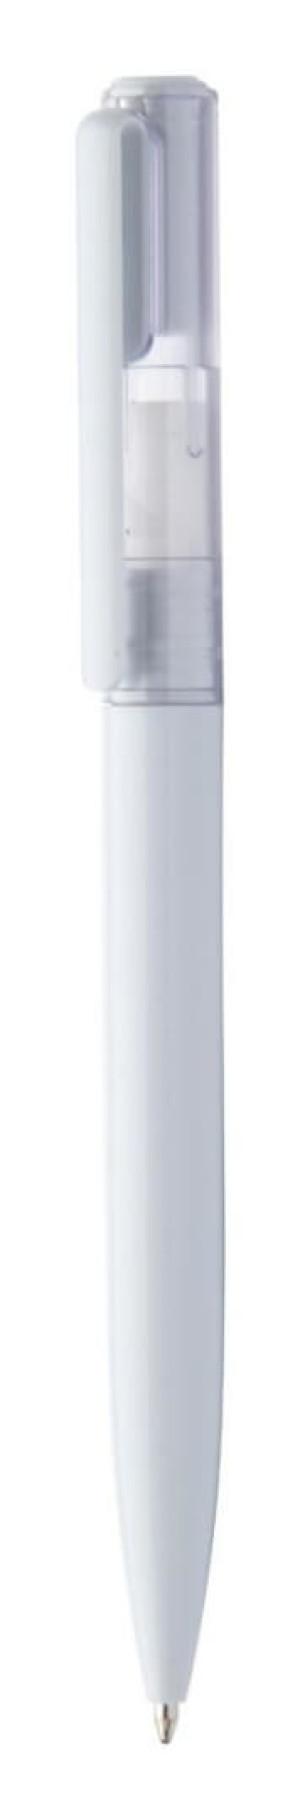 Vivarium pen